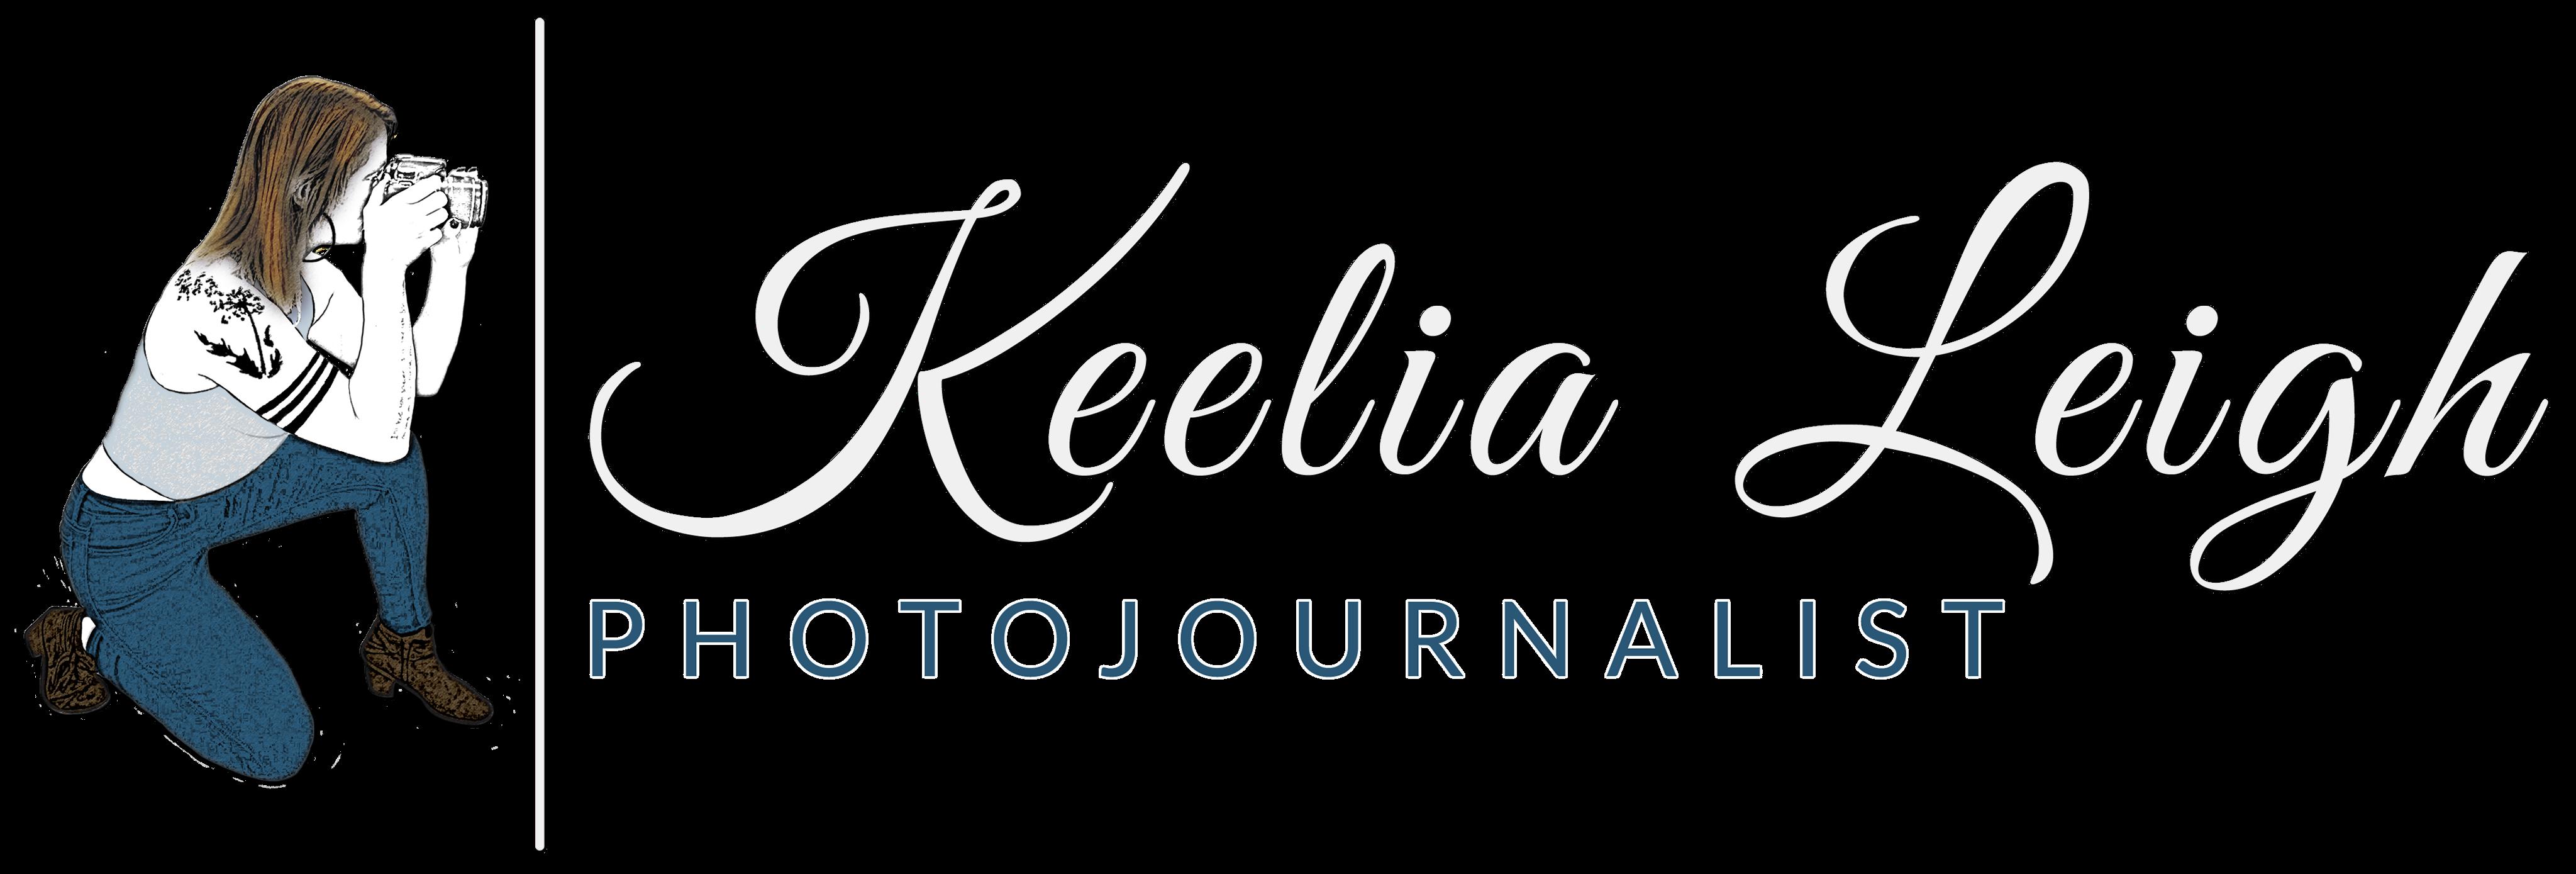 Keelia Trively